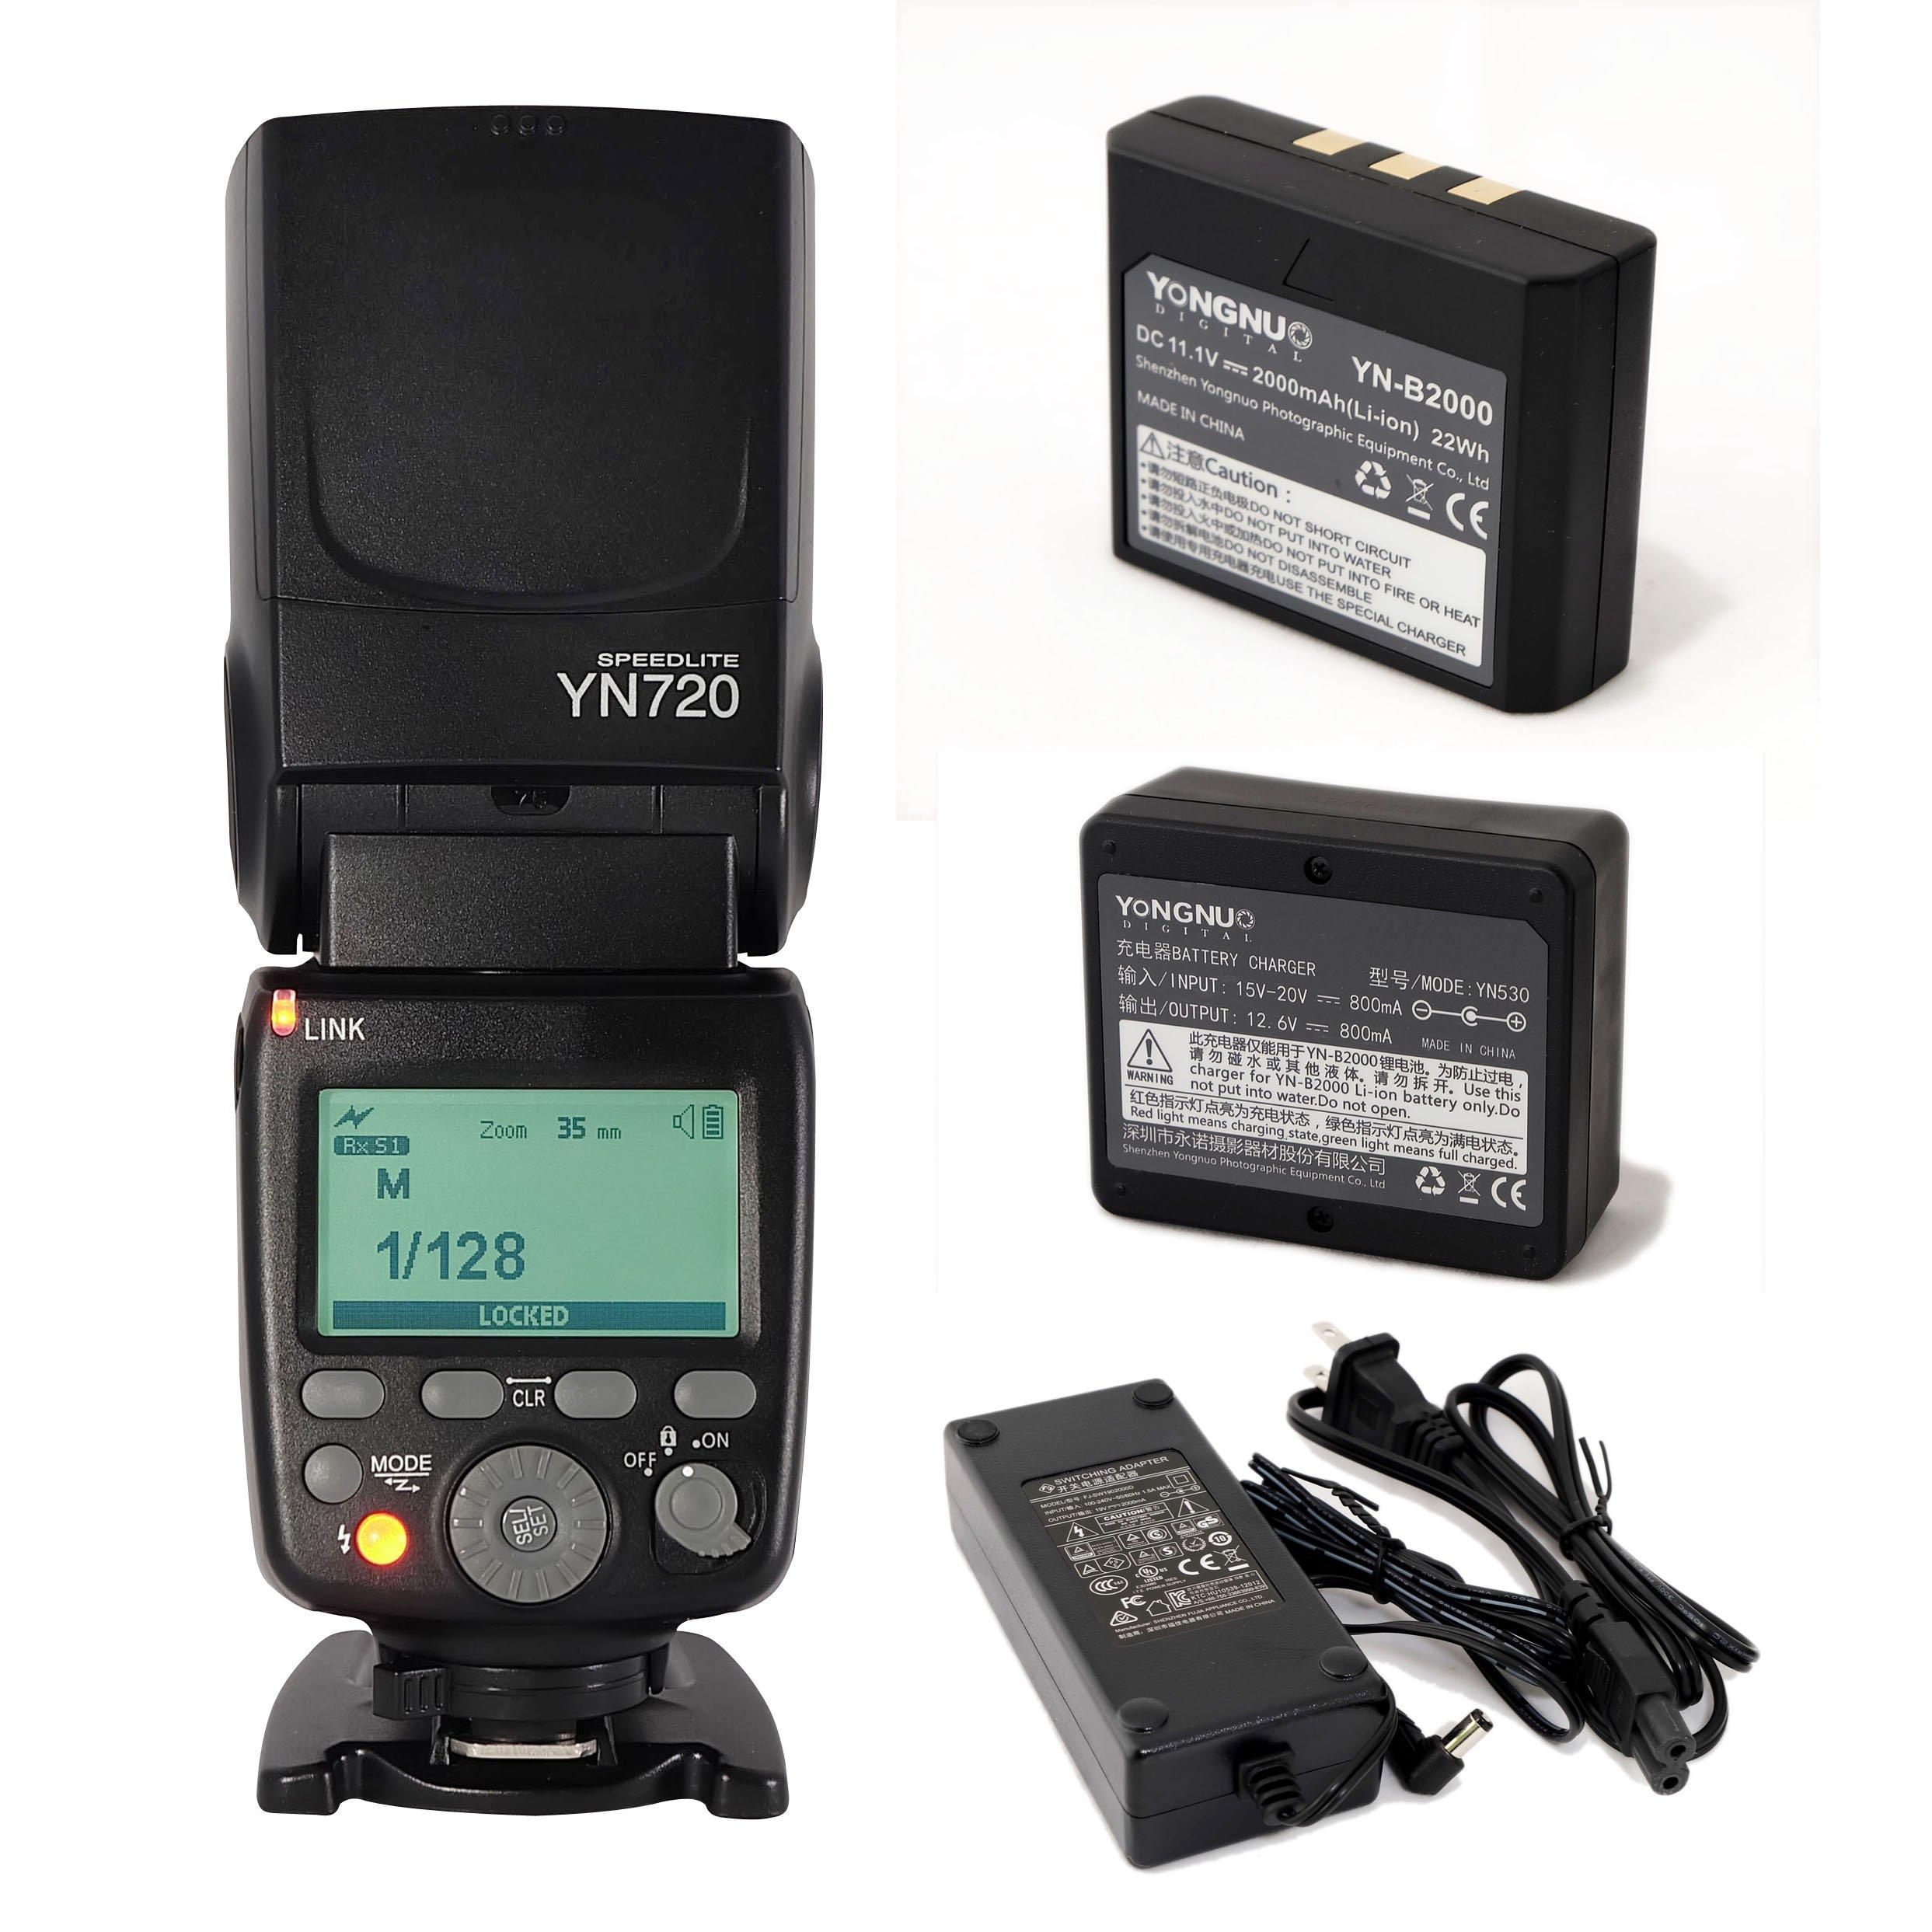 YONGNUO YN720 Lithum Battery Wireless Flash Speedlite GN60 2.4G Wireless Radio Master+ Slave for Canon Nikon Pentax